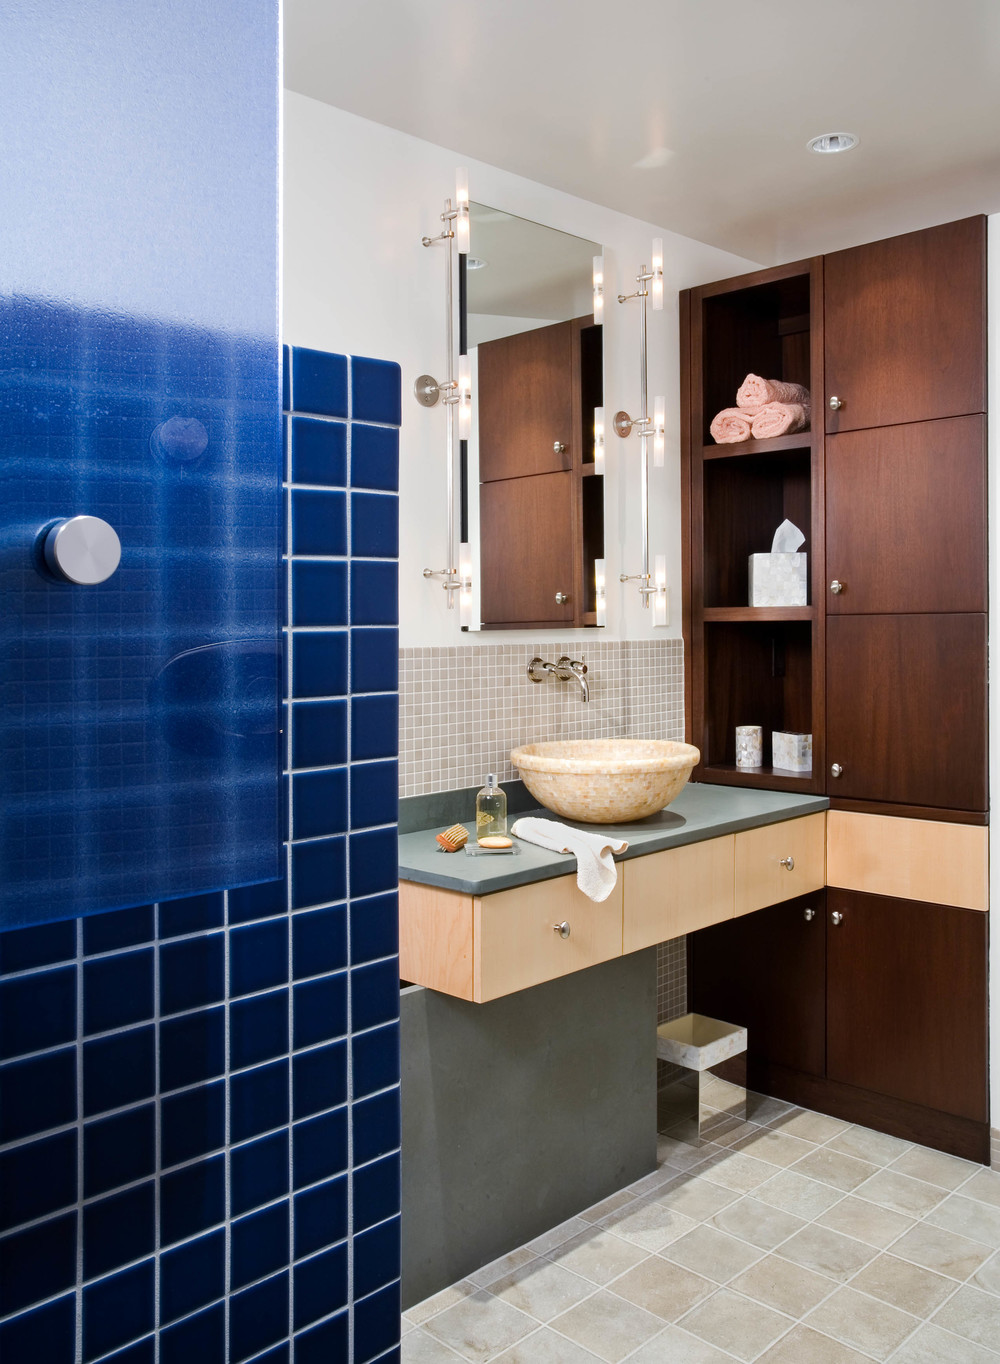 Water rooms — EJ krupinsky innovative residential spaces